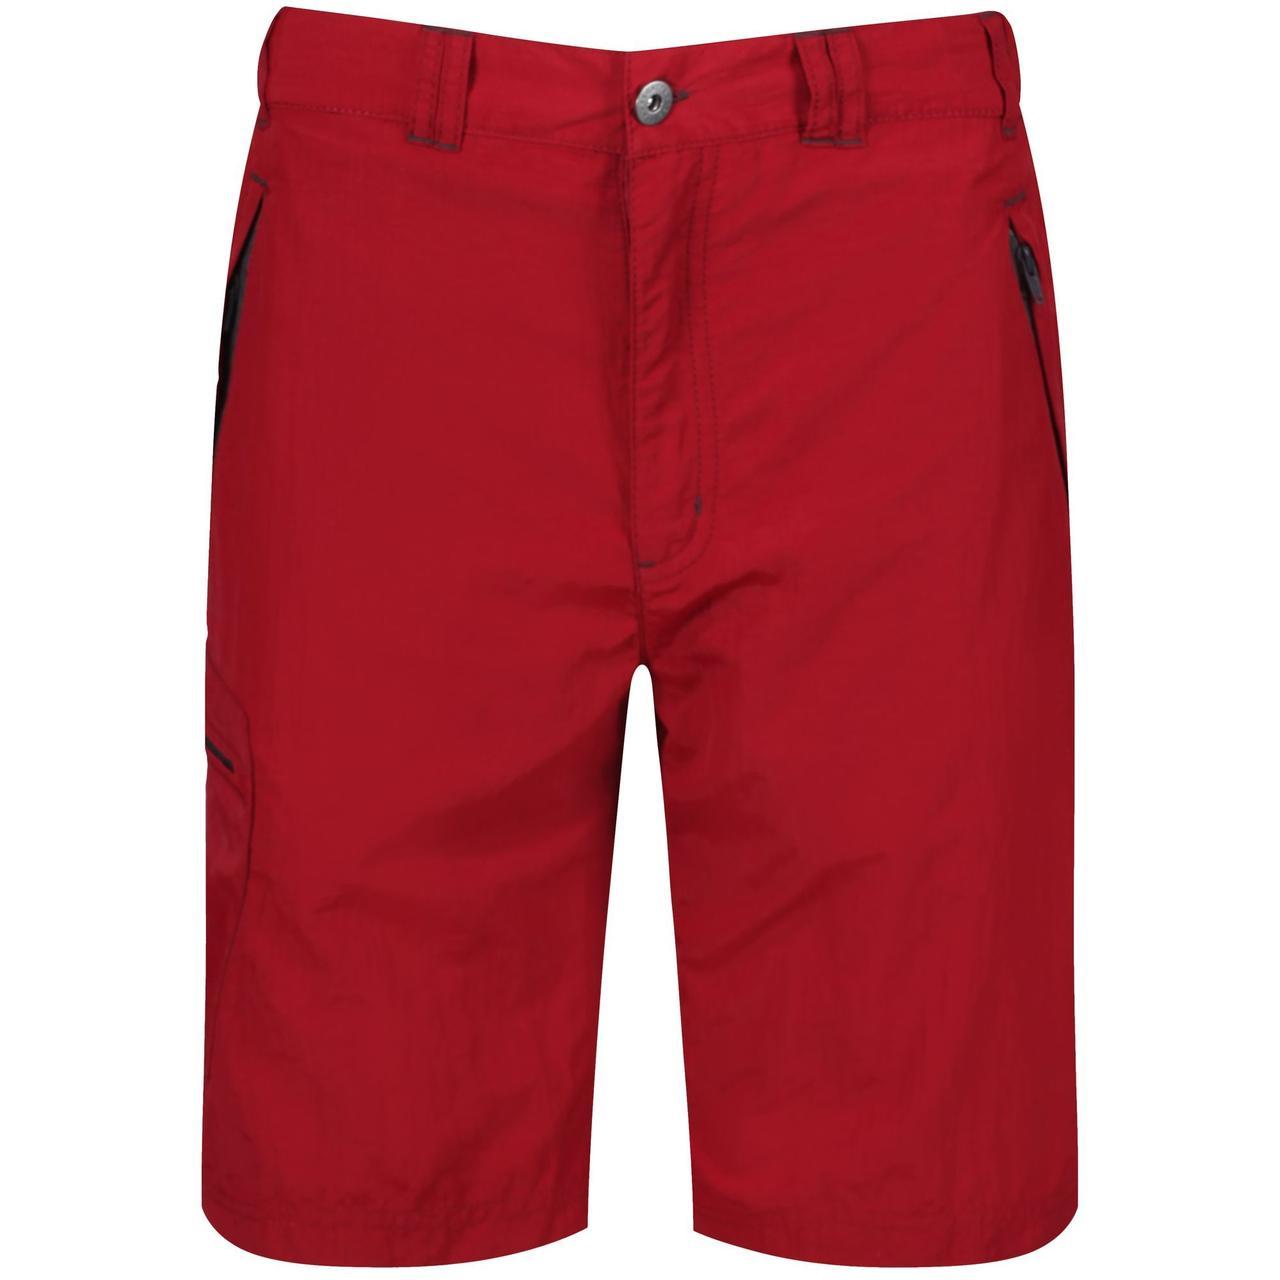 Шорты Regatta Leesville Short Красный (RMJ173_649_48)